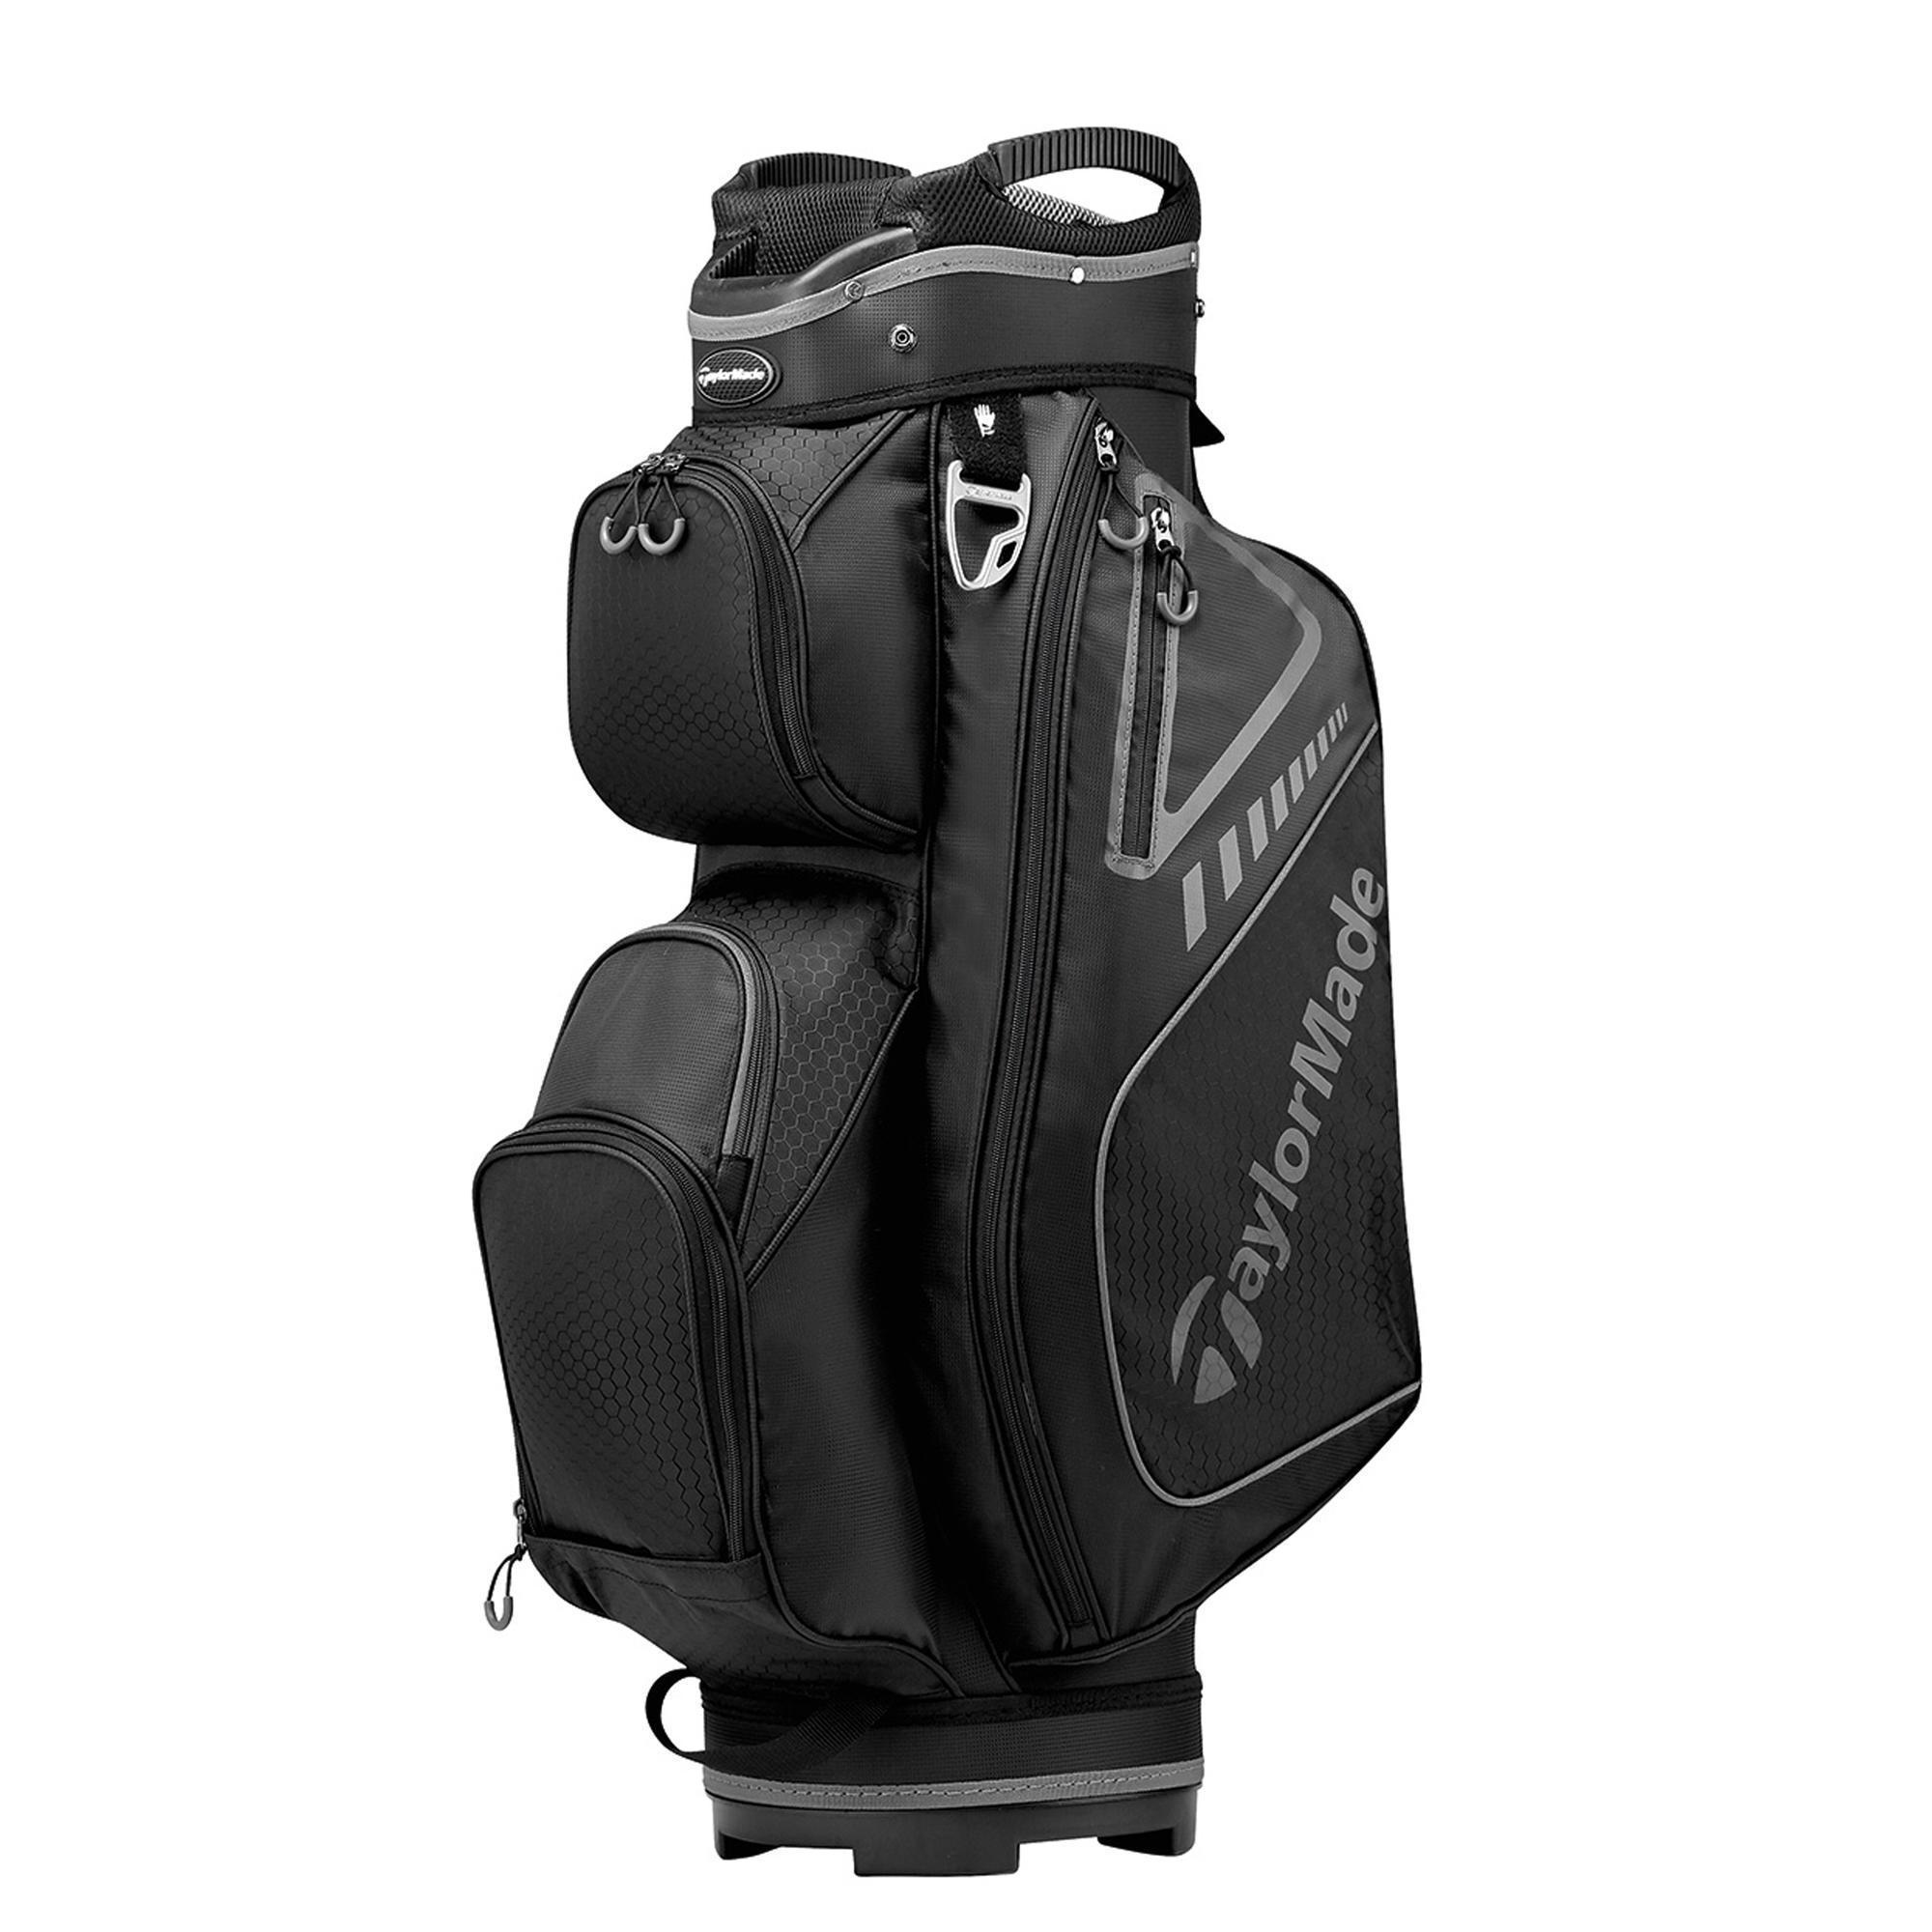 Taylormade Golf trolleytas donkergrijs kopen